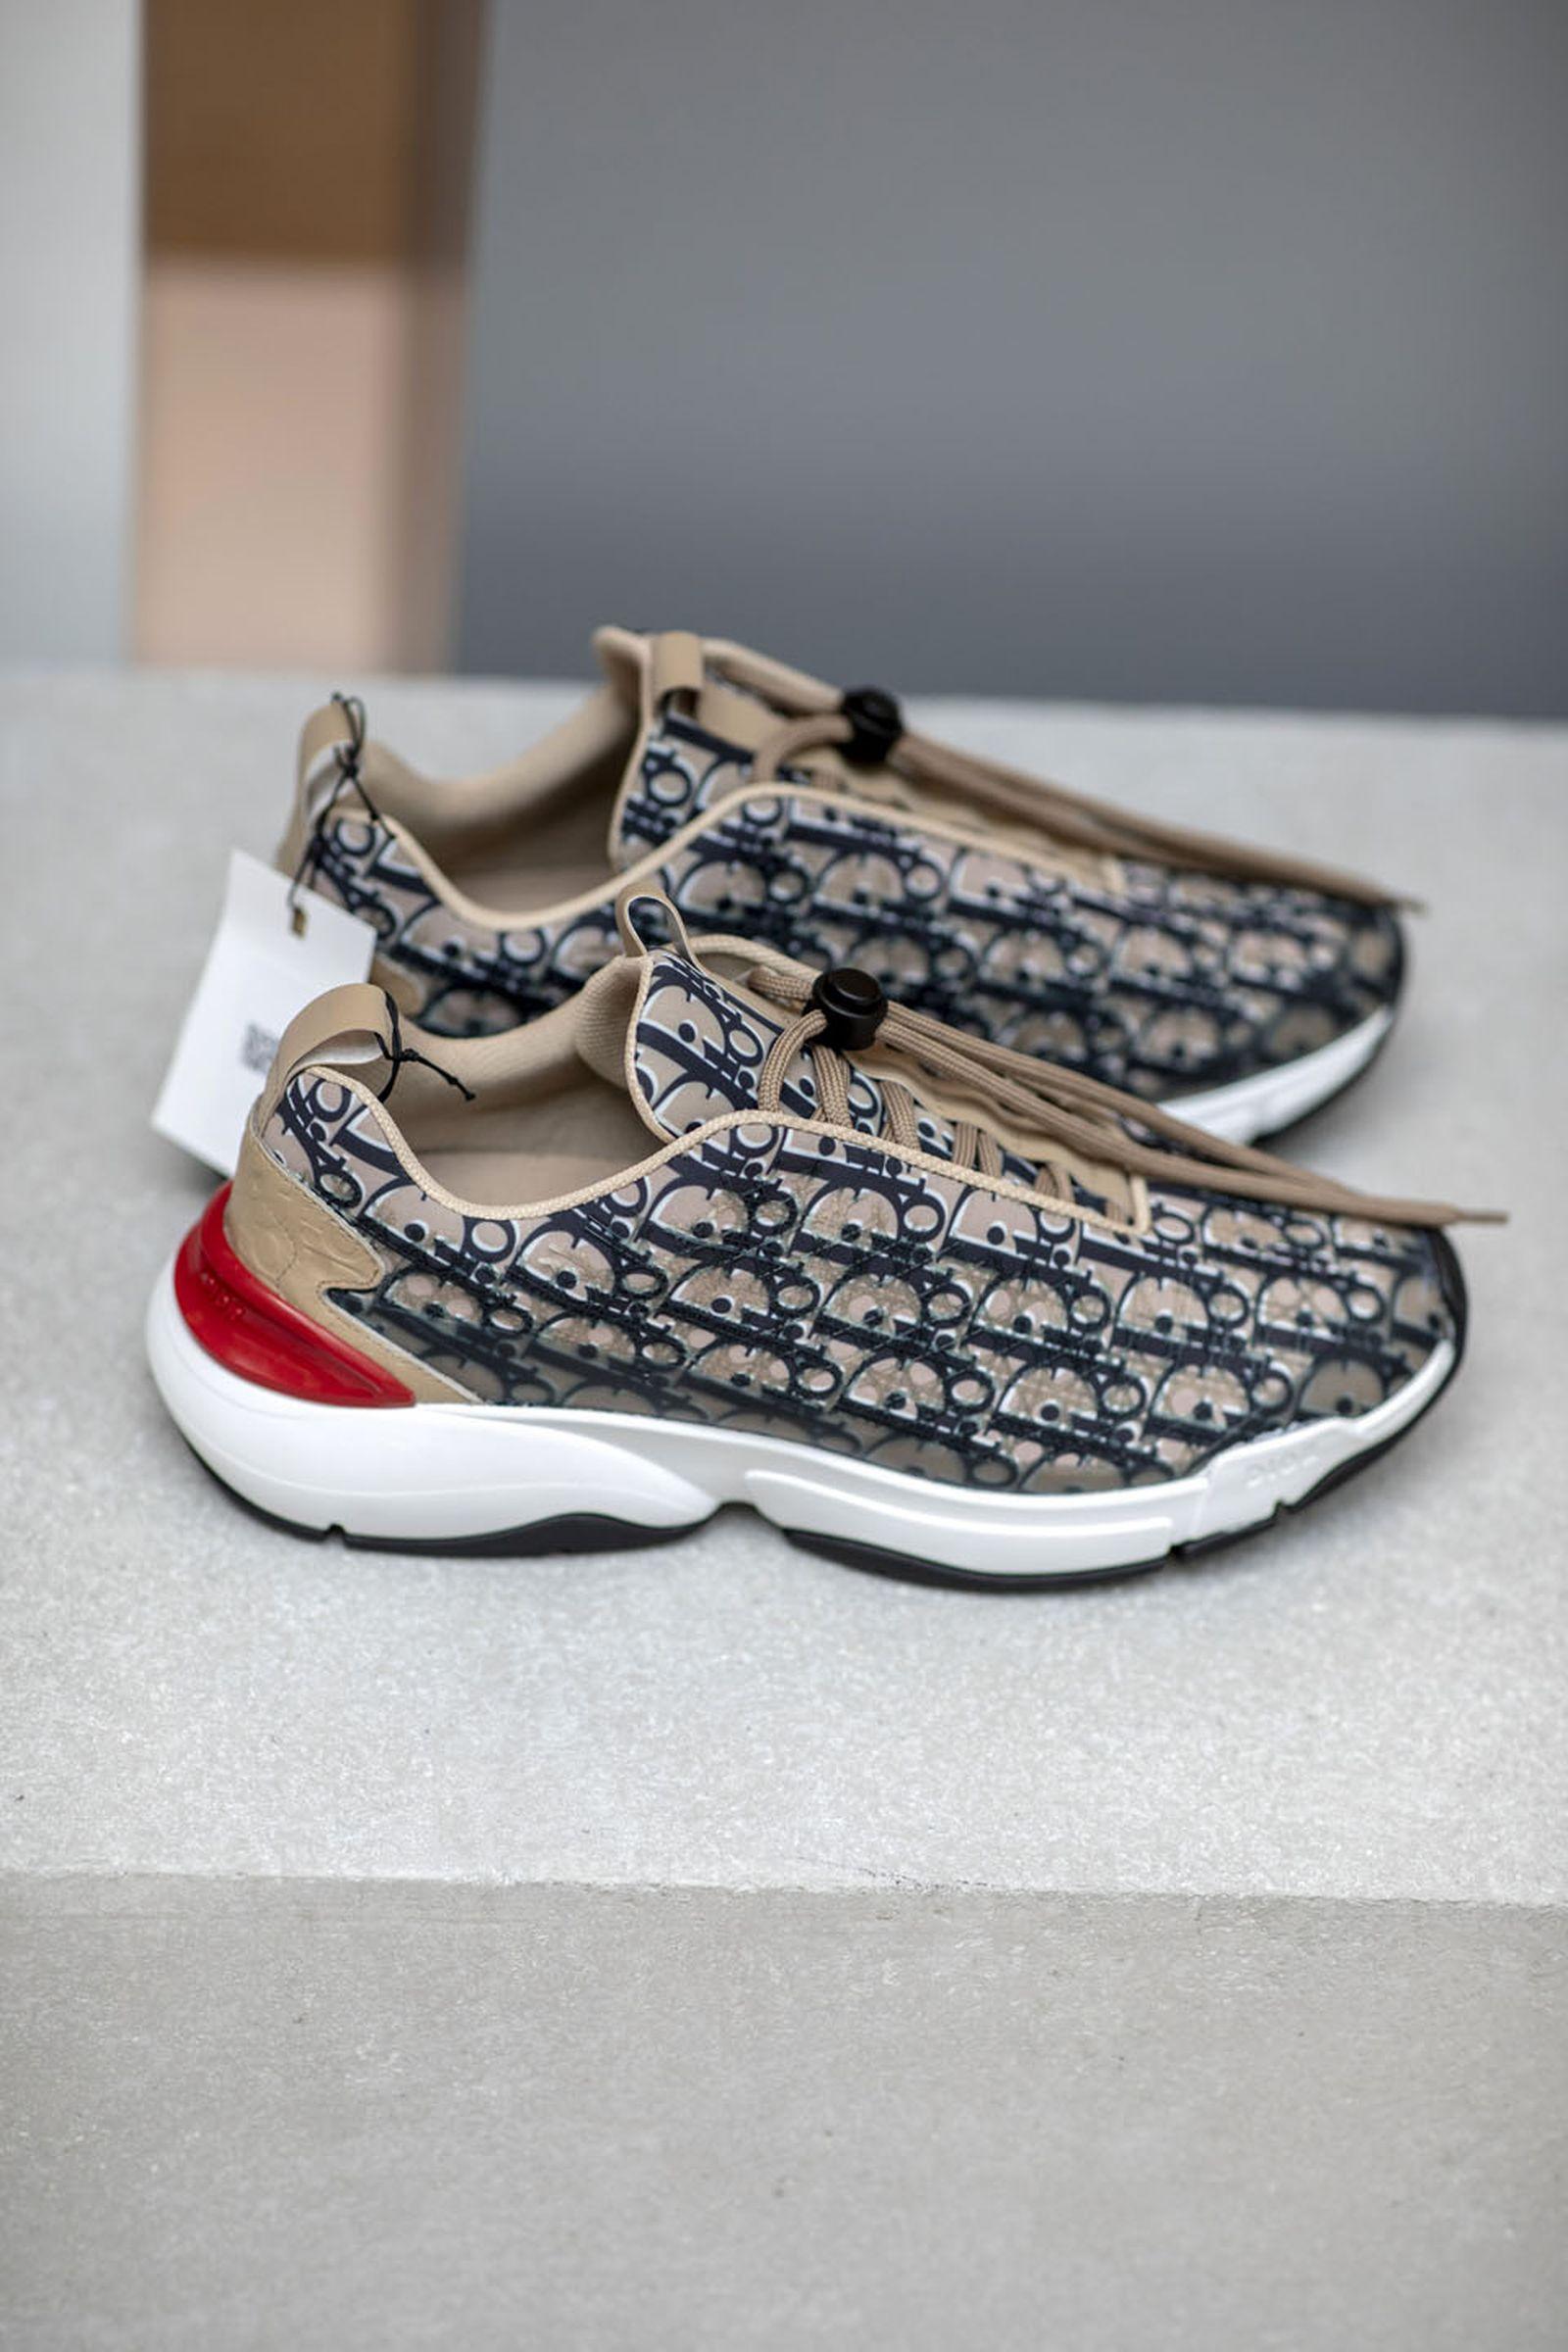 dior ss19 sneakers10 kim jones